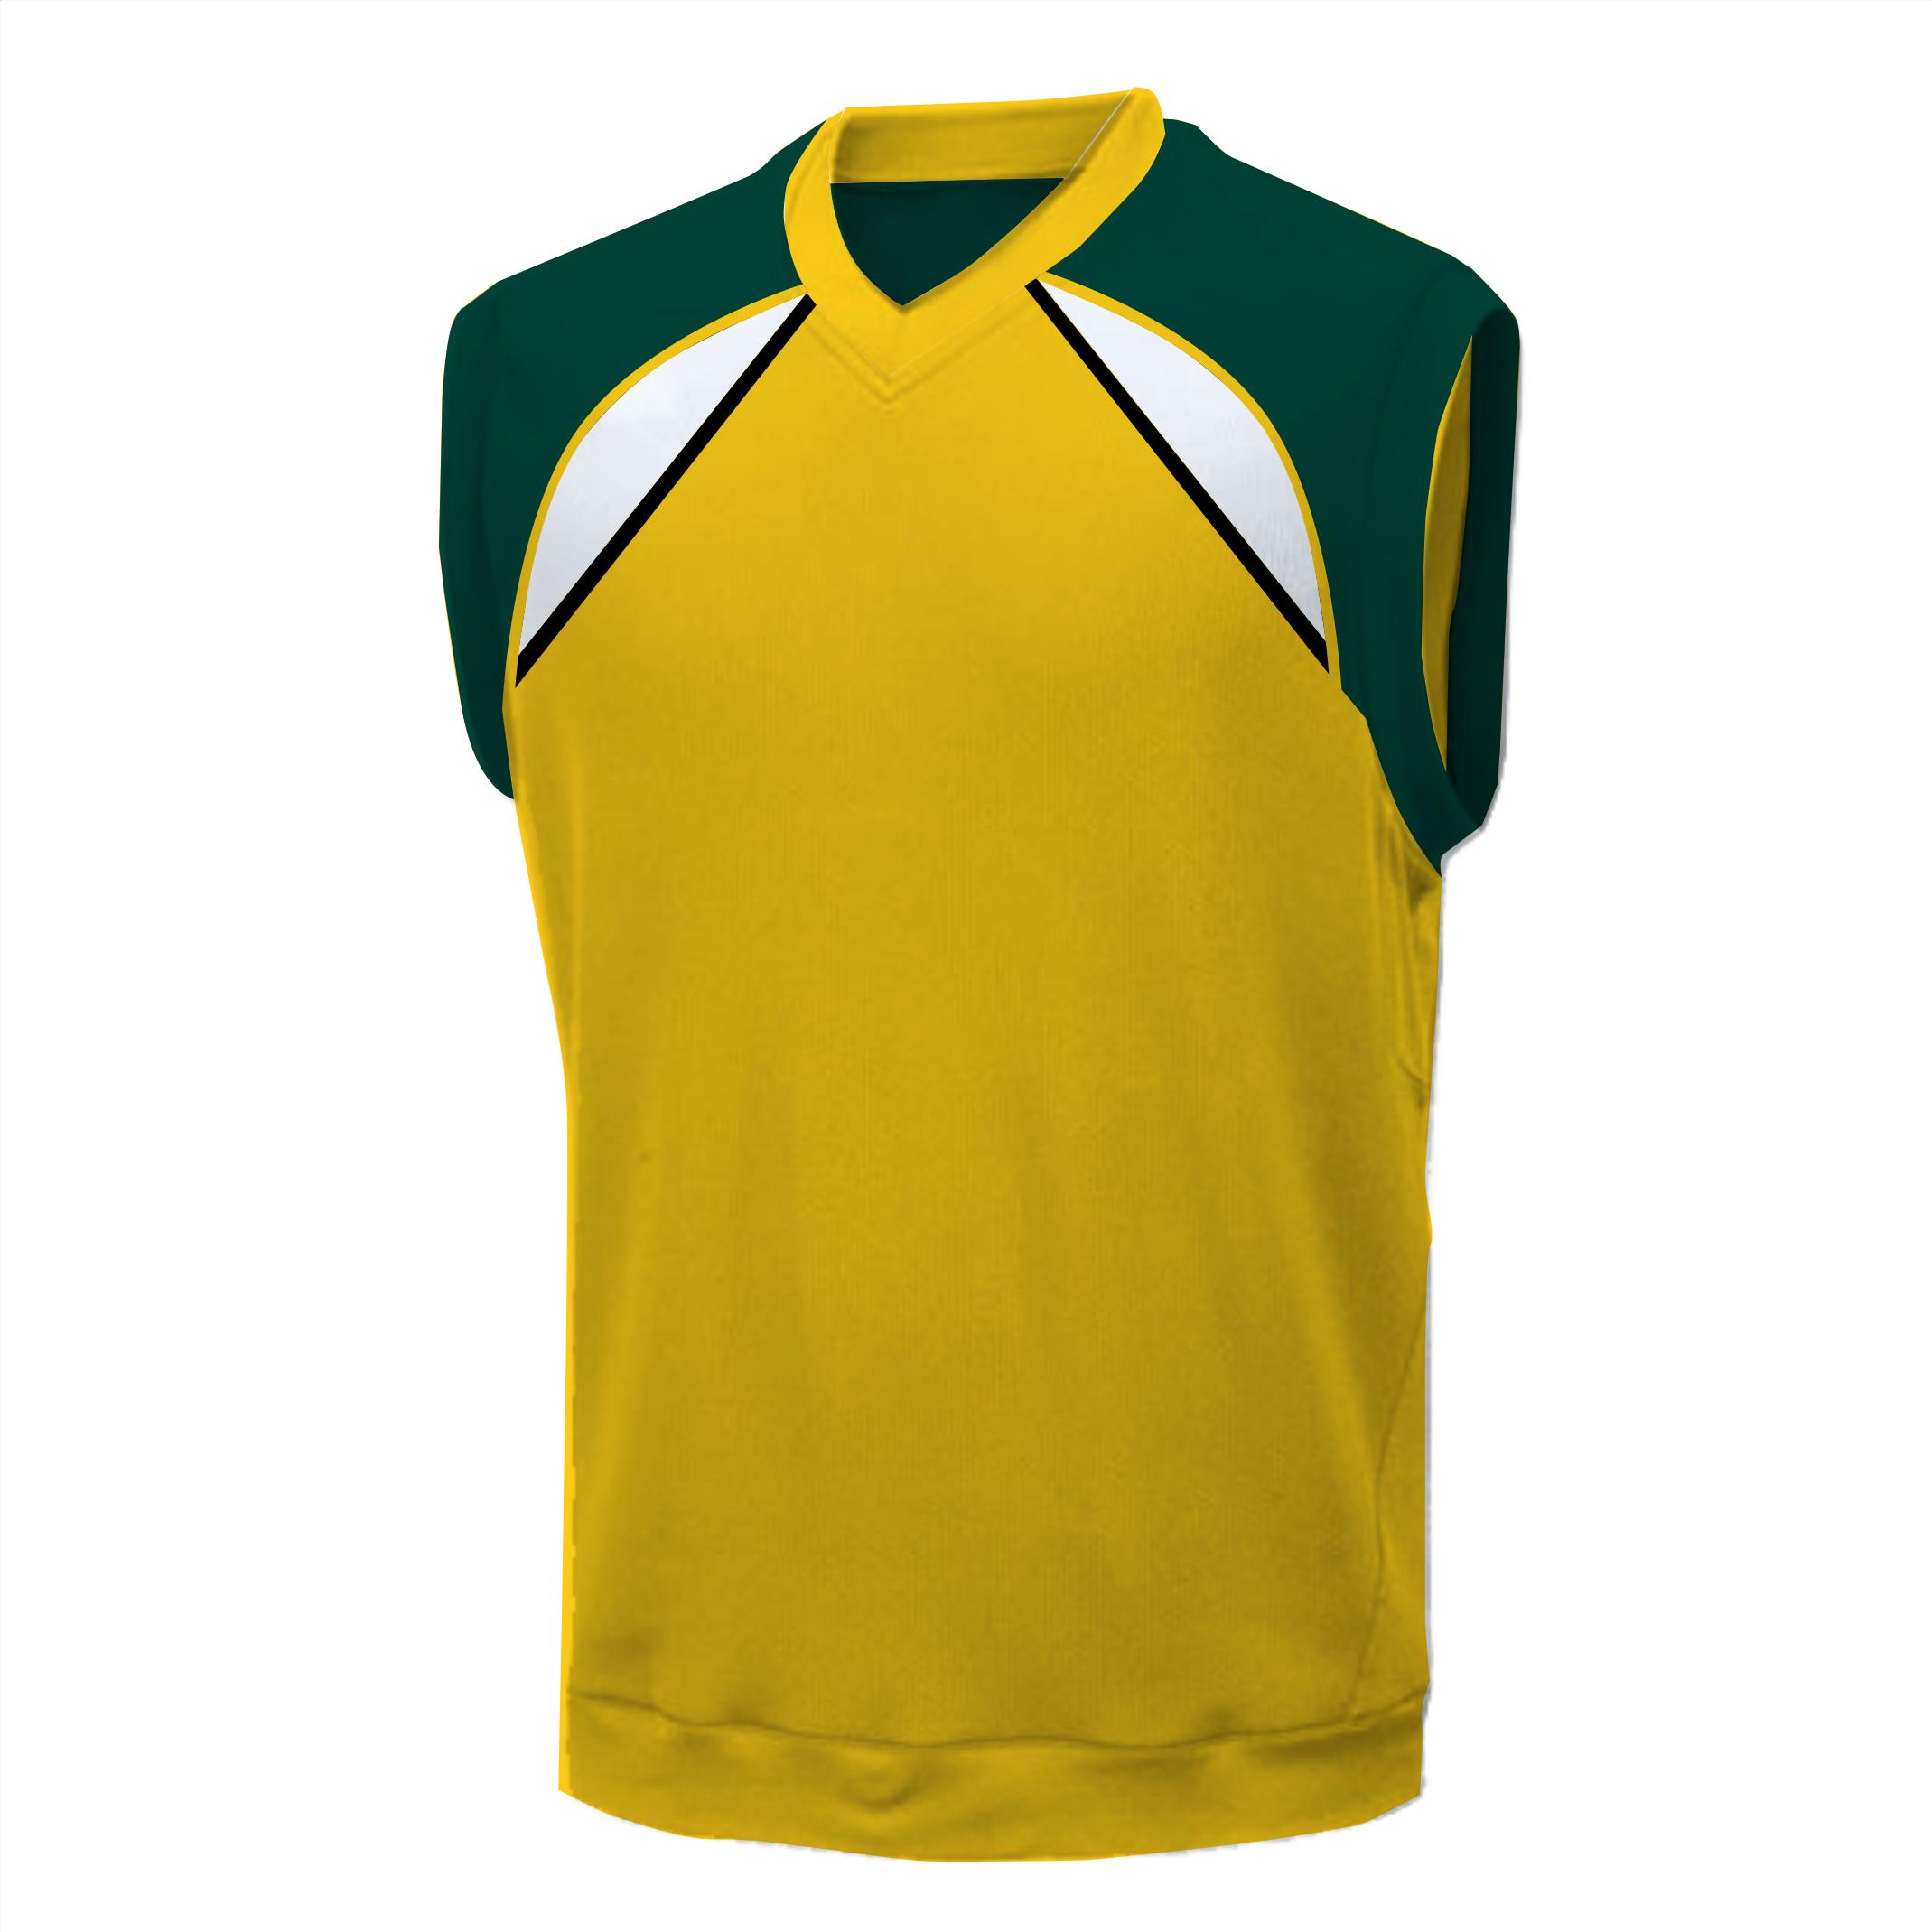 Panelled Zuco mens VB shirt - Mick